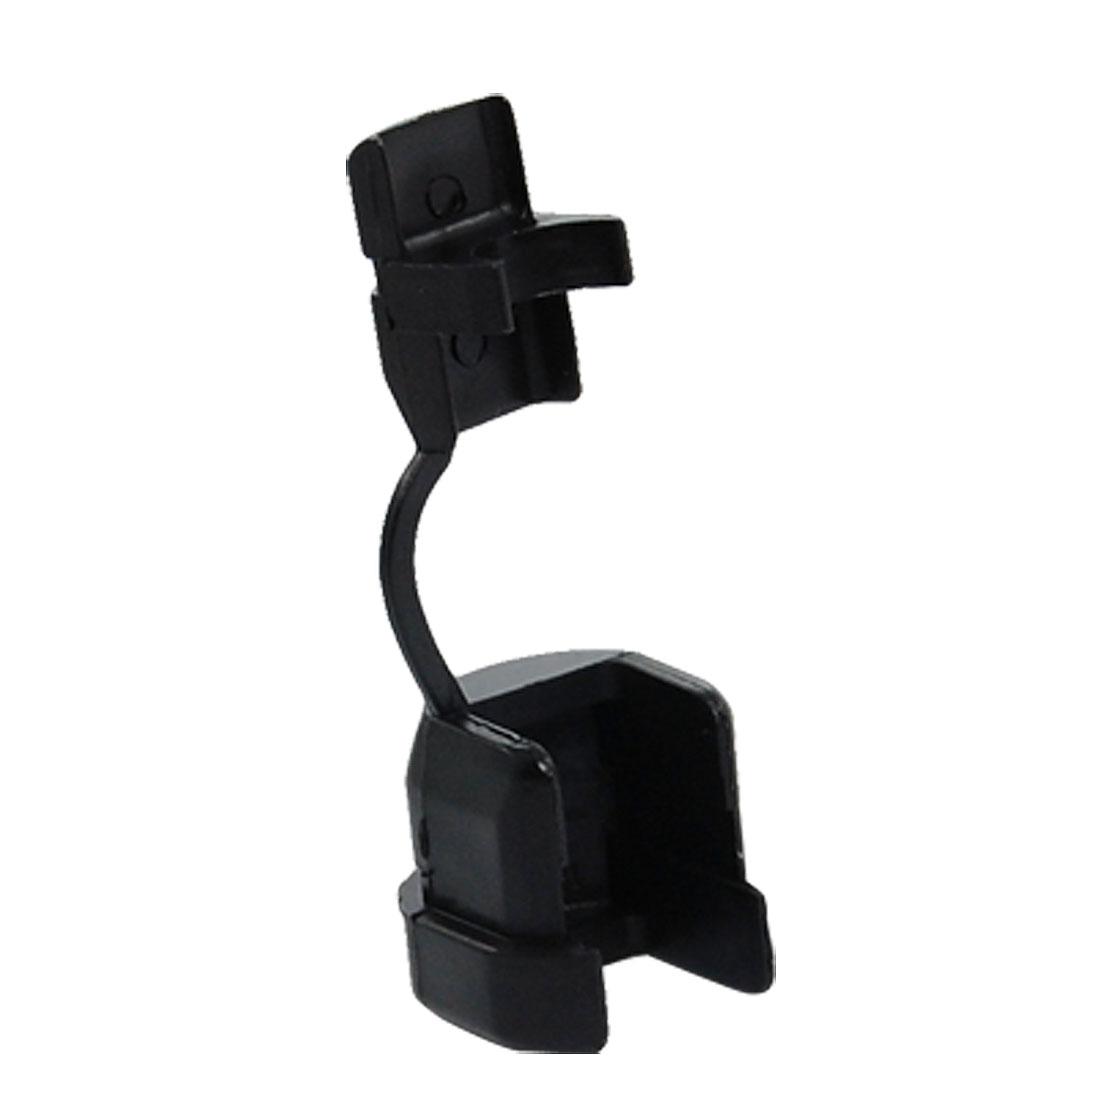 500 Pcs 6N-4 Black Nylon Round Wire Type Strain Relief Bushing